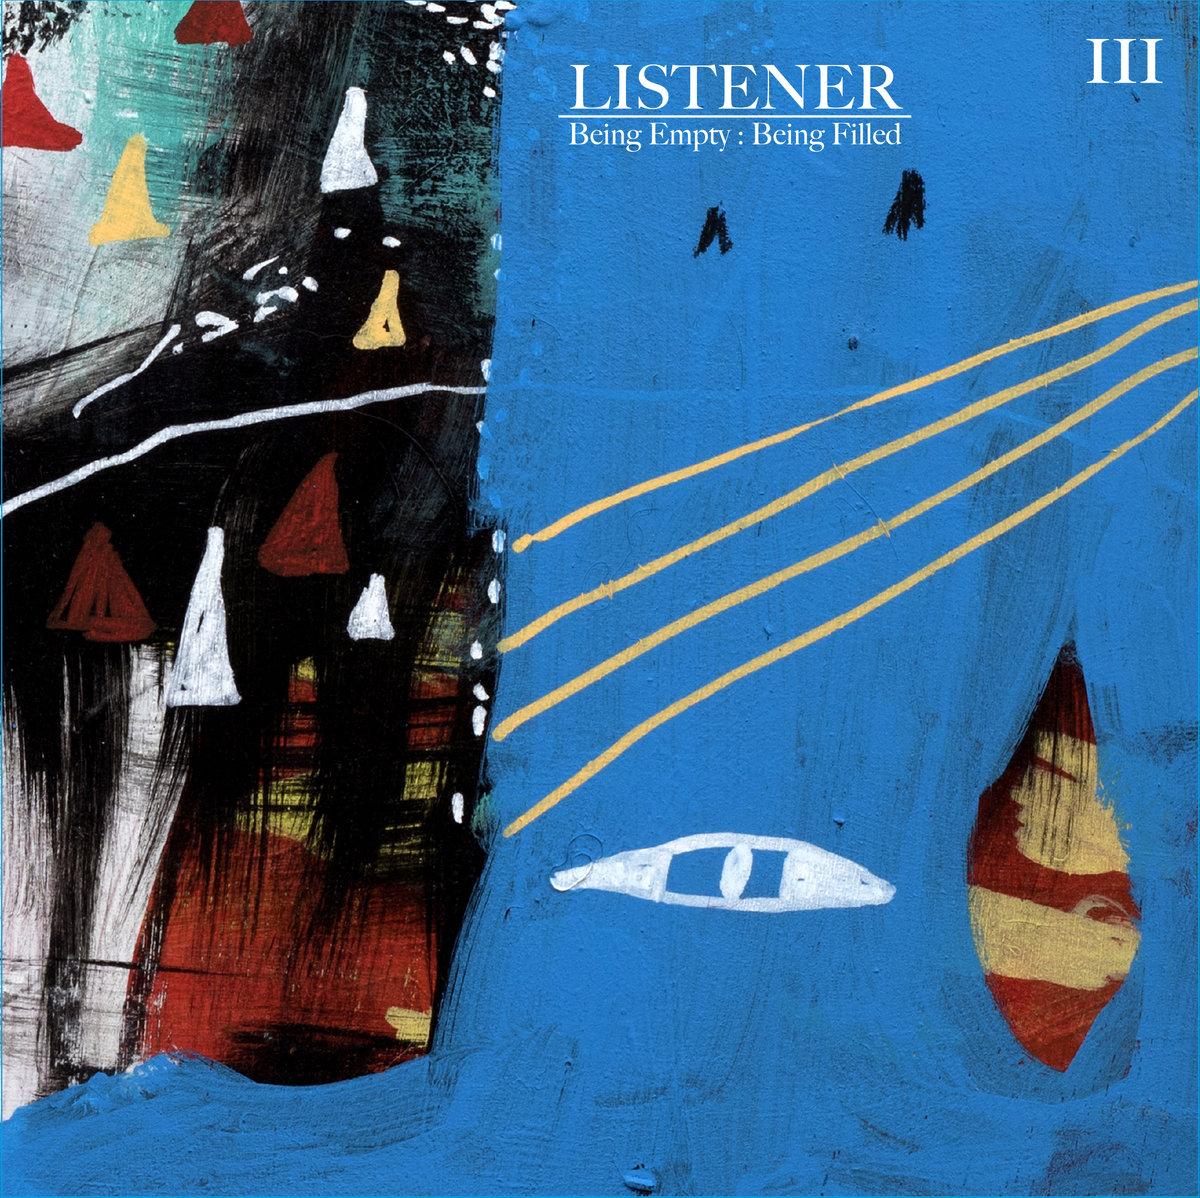 Listener - Being Empty : Being Filled Vol. III